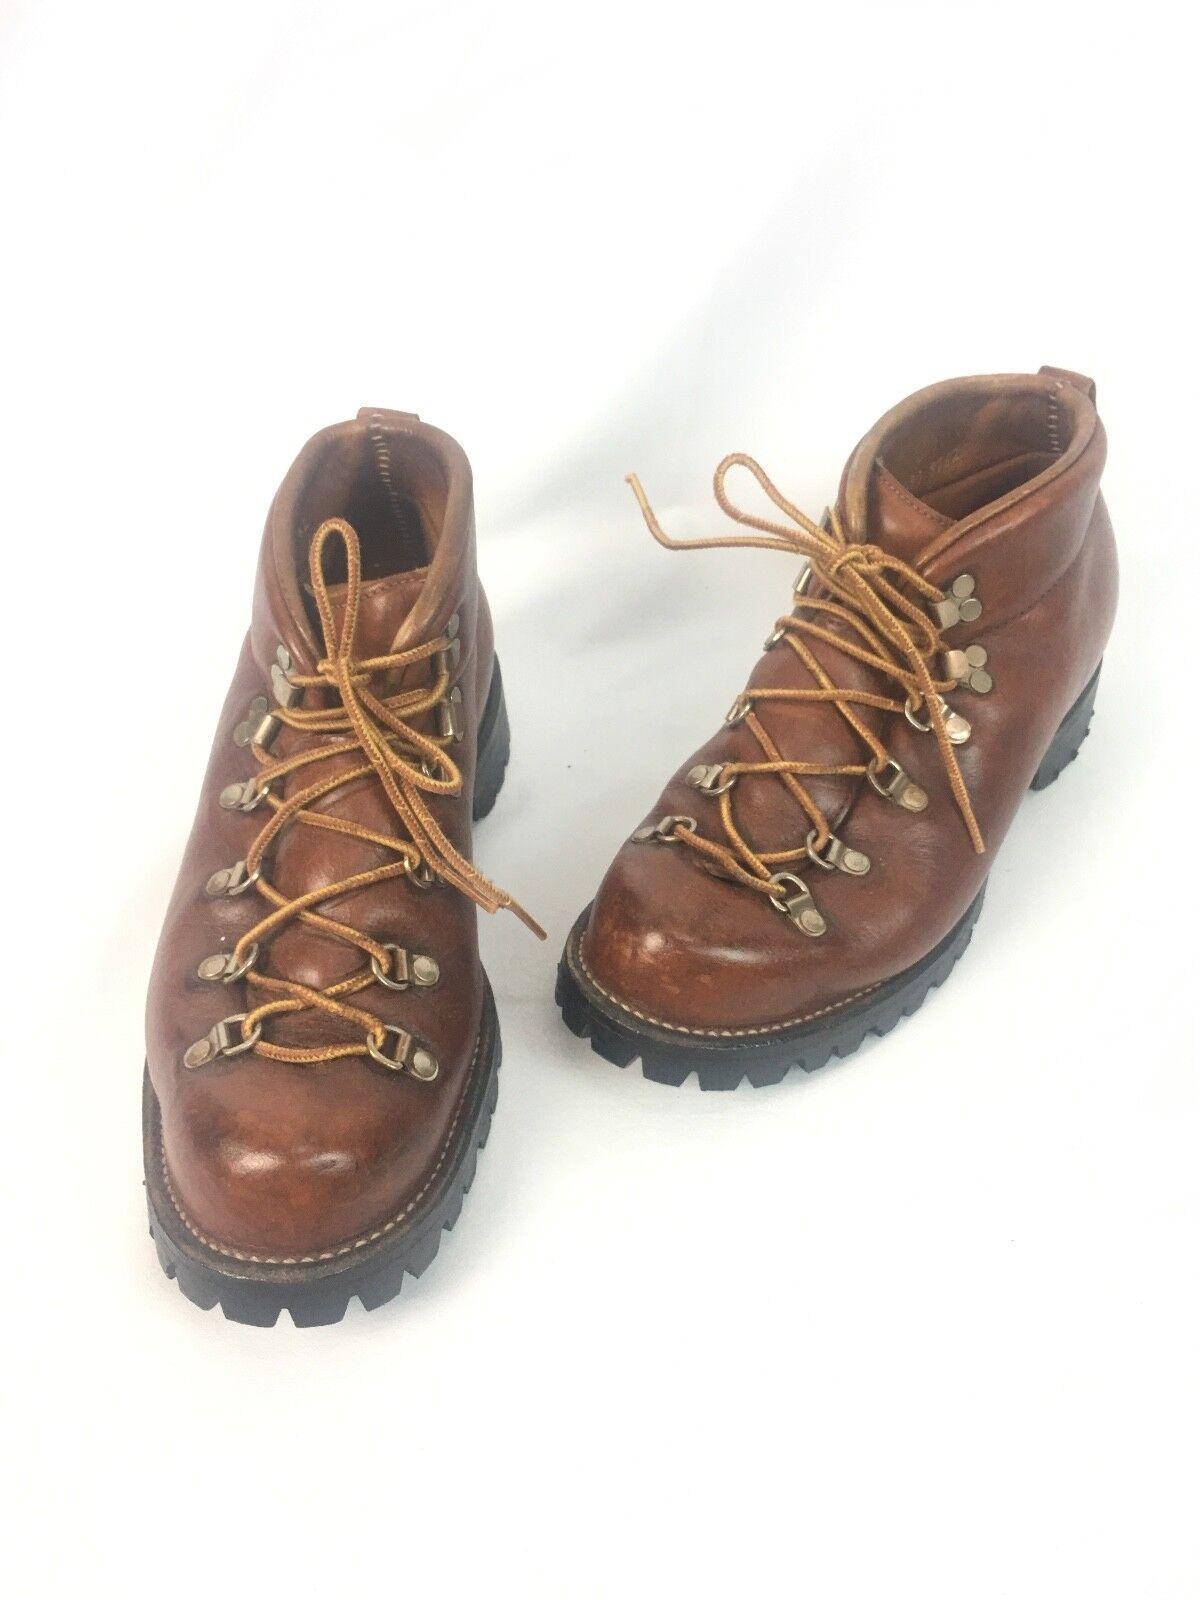 * Danner * Uomo Vintage Mountain Pelle Hiking Stivali marrone 8.5 D US / 42-43 EU